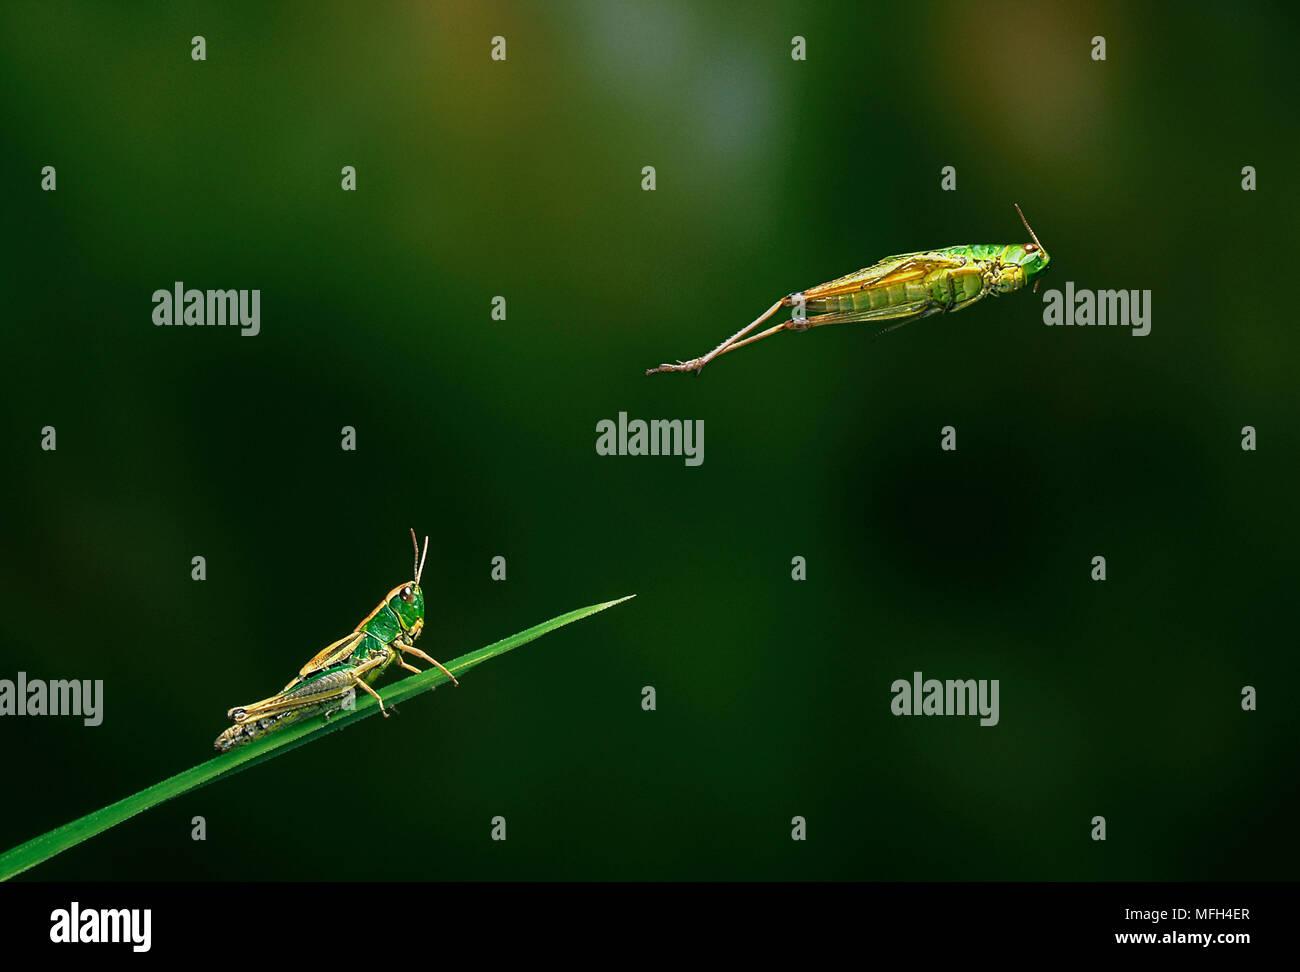 Wiese grashüpfer Chorthippus parallelus leaping Multiflash Bild Stockbild